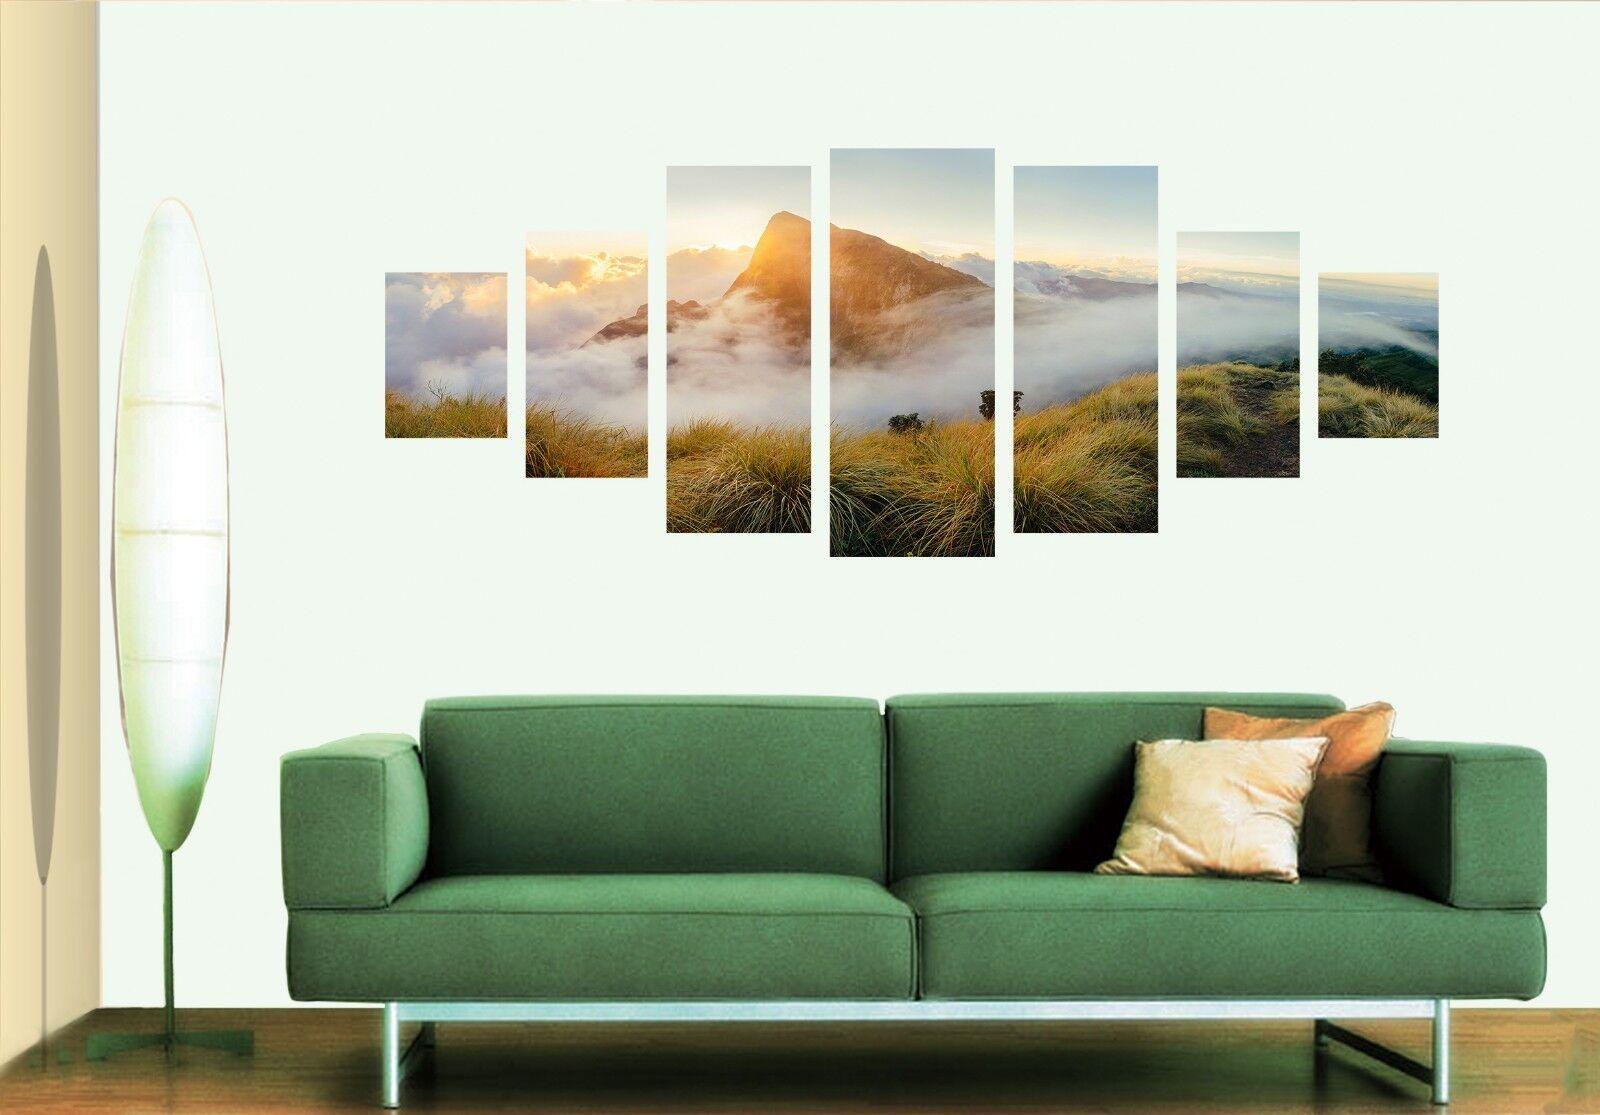 3D Sunlight Peak 677 Unframed Print Wall Paper Decal Wall Deco Indoor AJ Wall